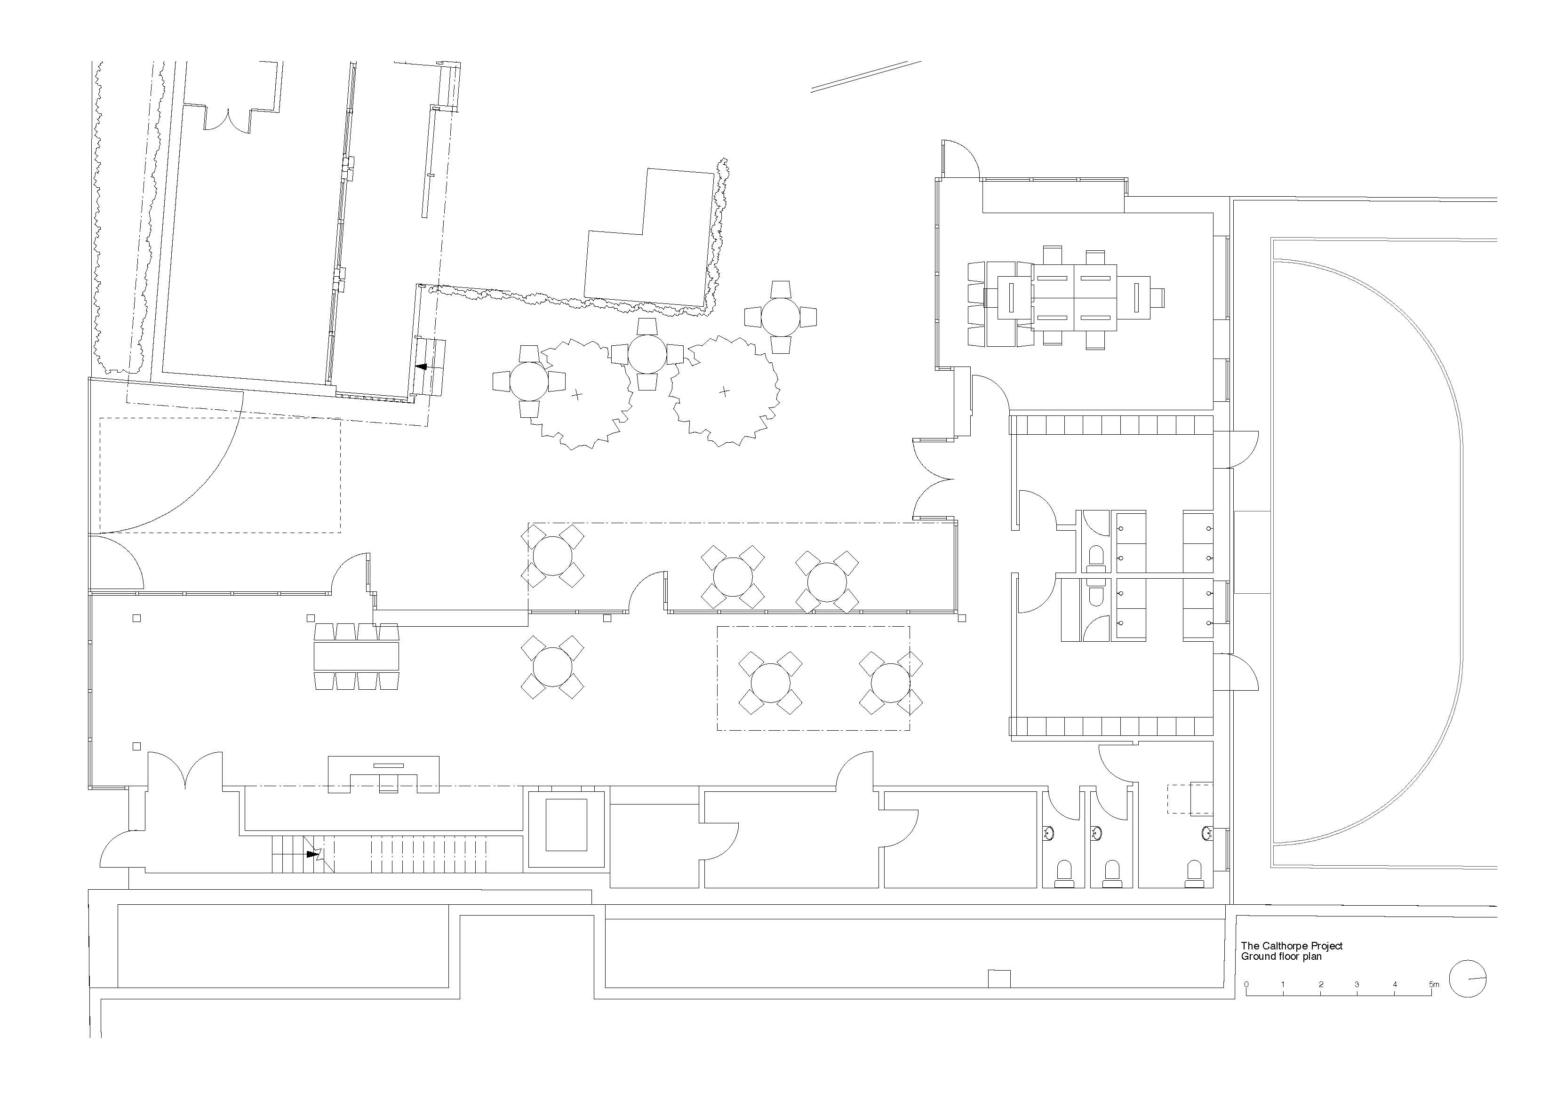 The Calthorpe ground floor plan